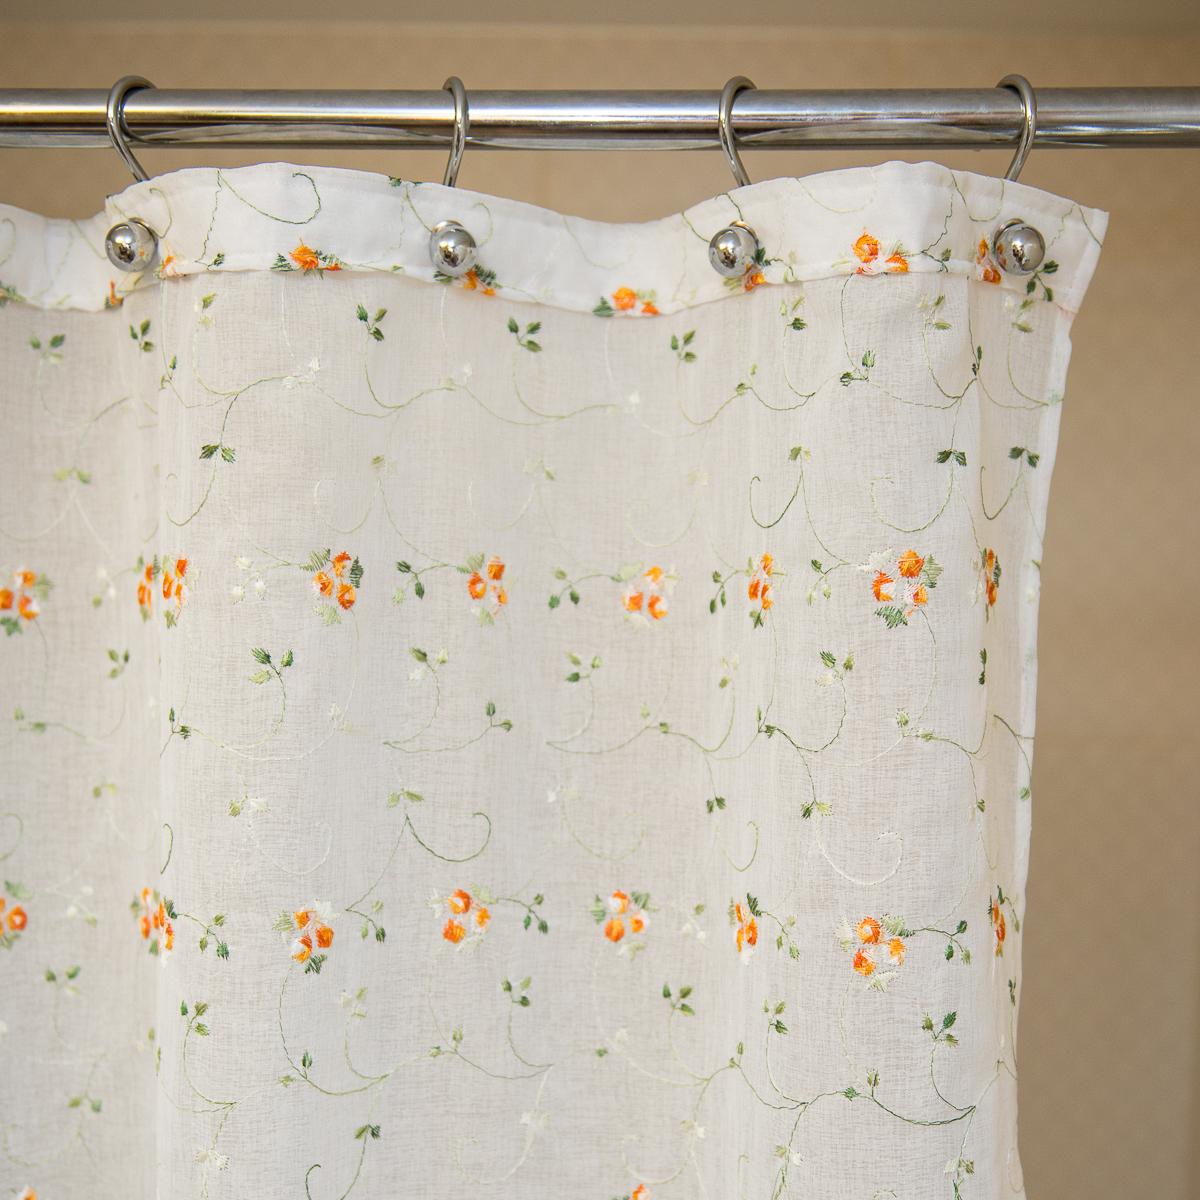 Шторки Элитная шторка для ванной 180x200 Pampa Yellow от Arti-Deco elitnaya-shtorka-dlya-vannoy-pampa-yellow-ot-arti-deco-ispaniya.jpg